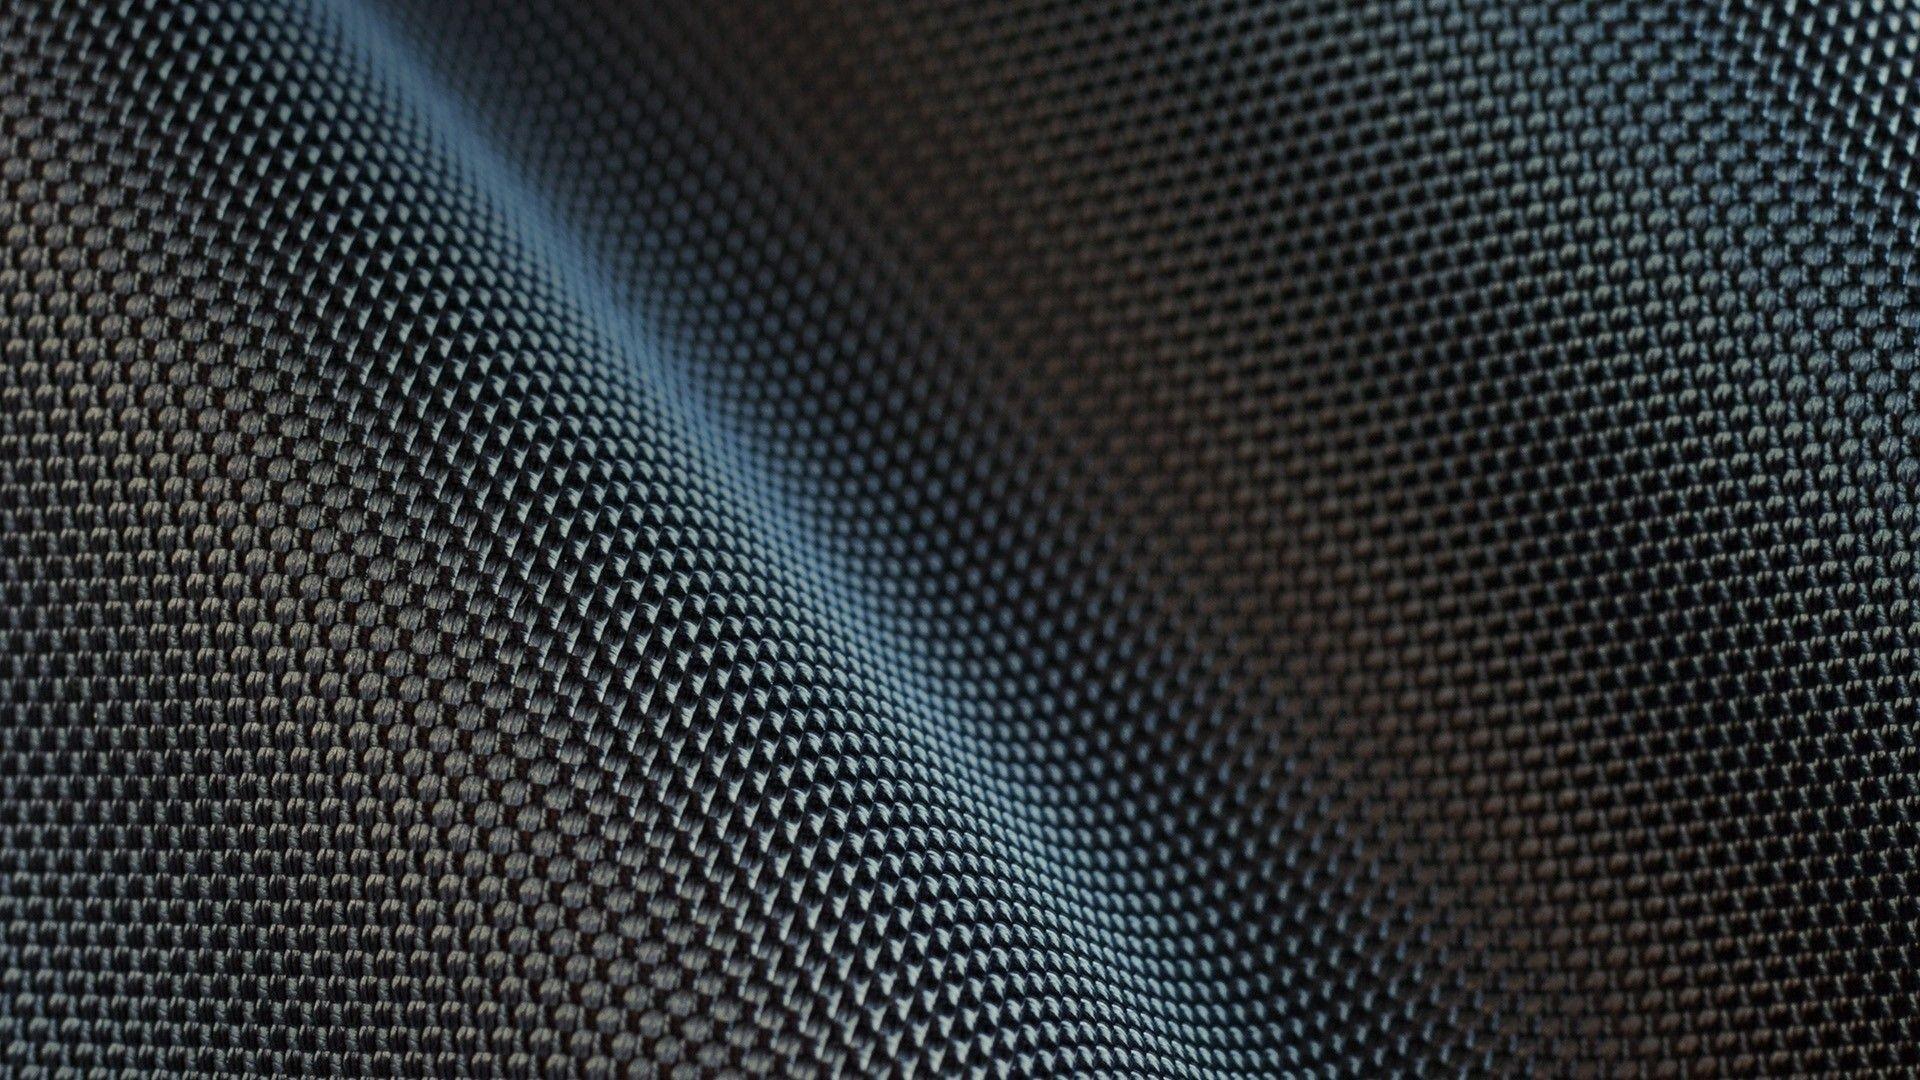 Carbon Fiber Download Free Wallpaper Image Search